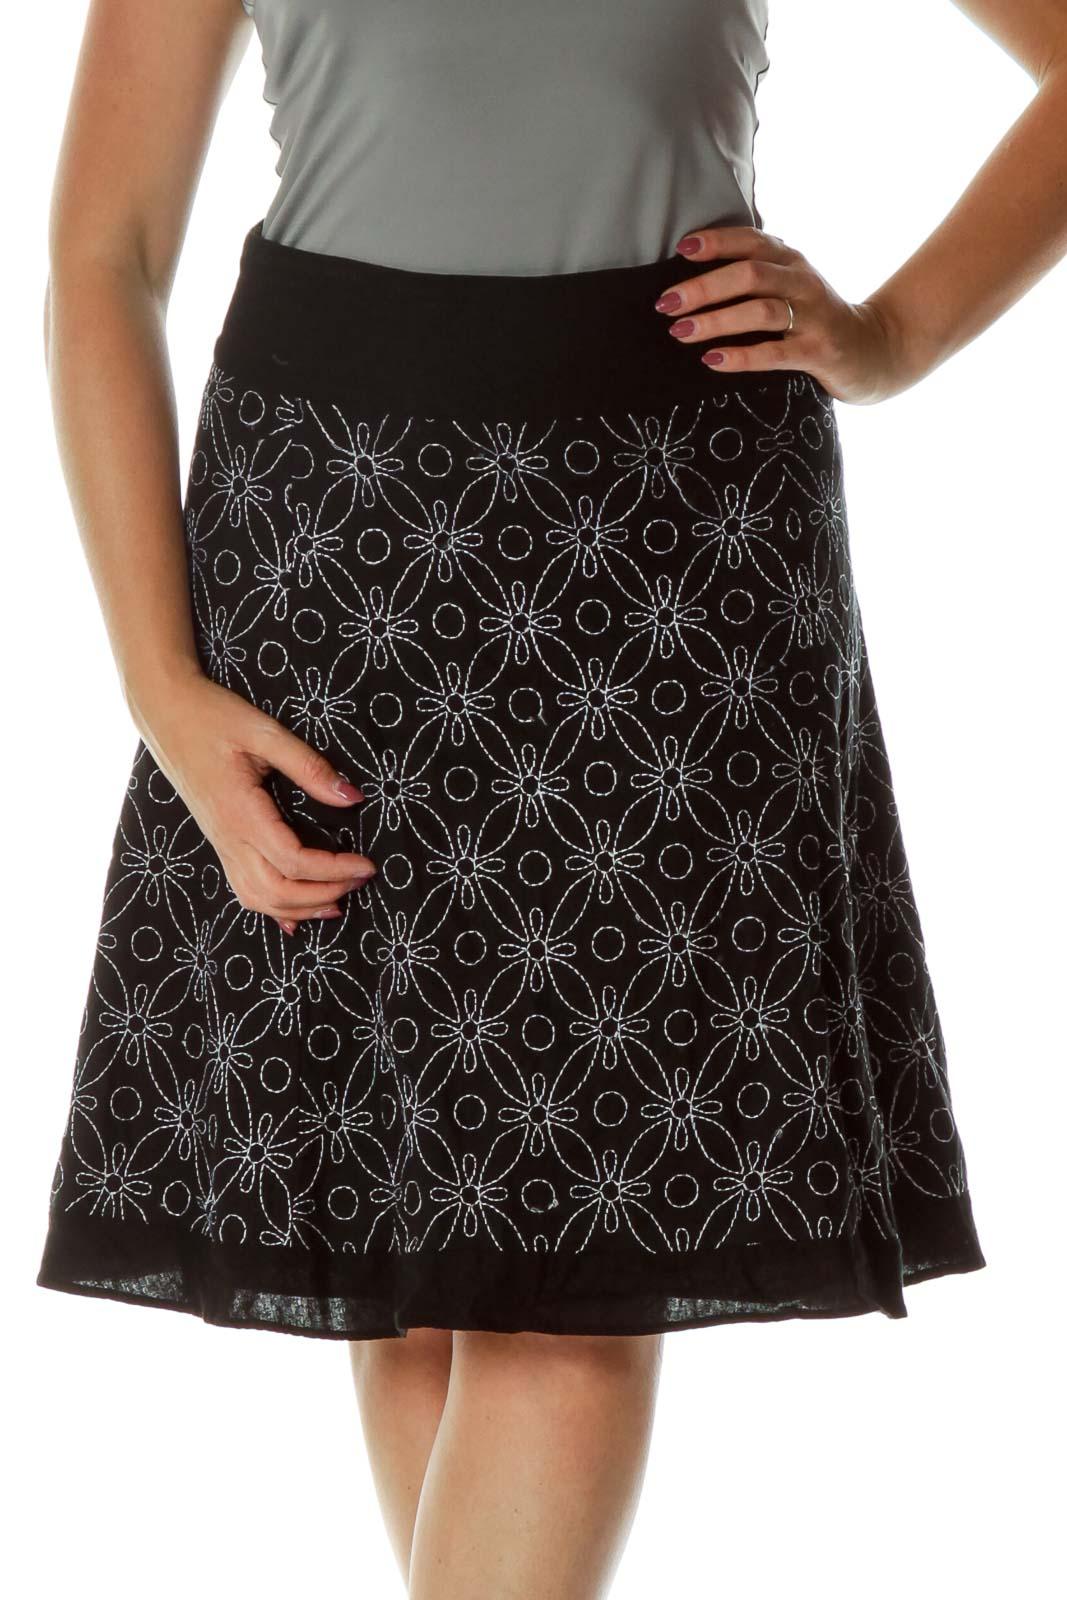 Black White Embroidered A-Line Skirt